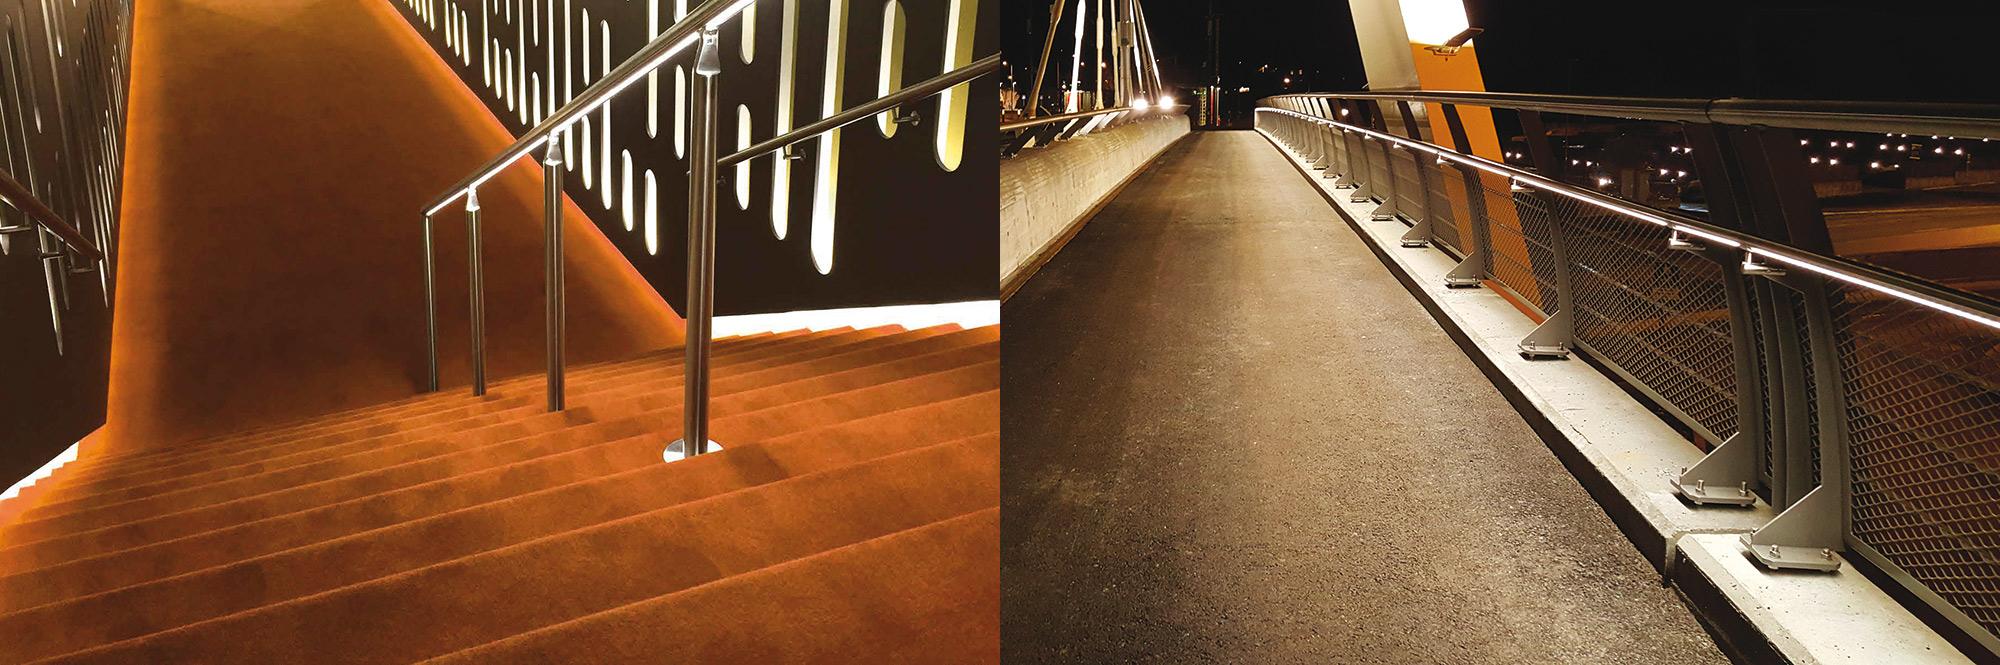 liniLED Handrail valaiseva käsijohde